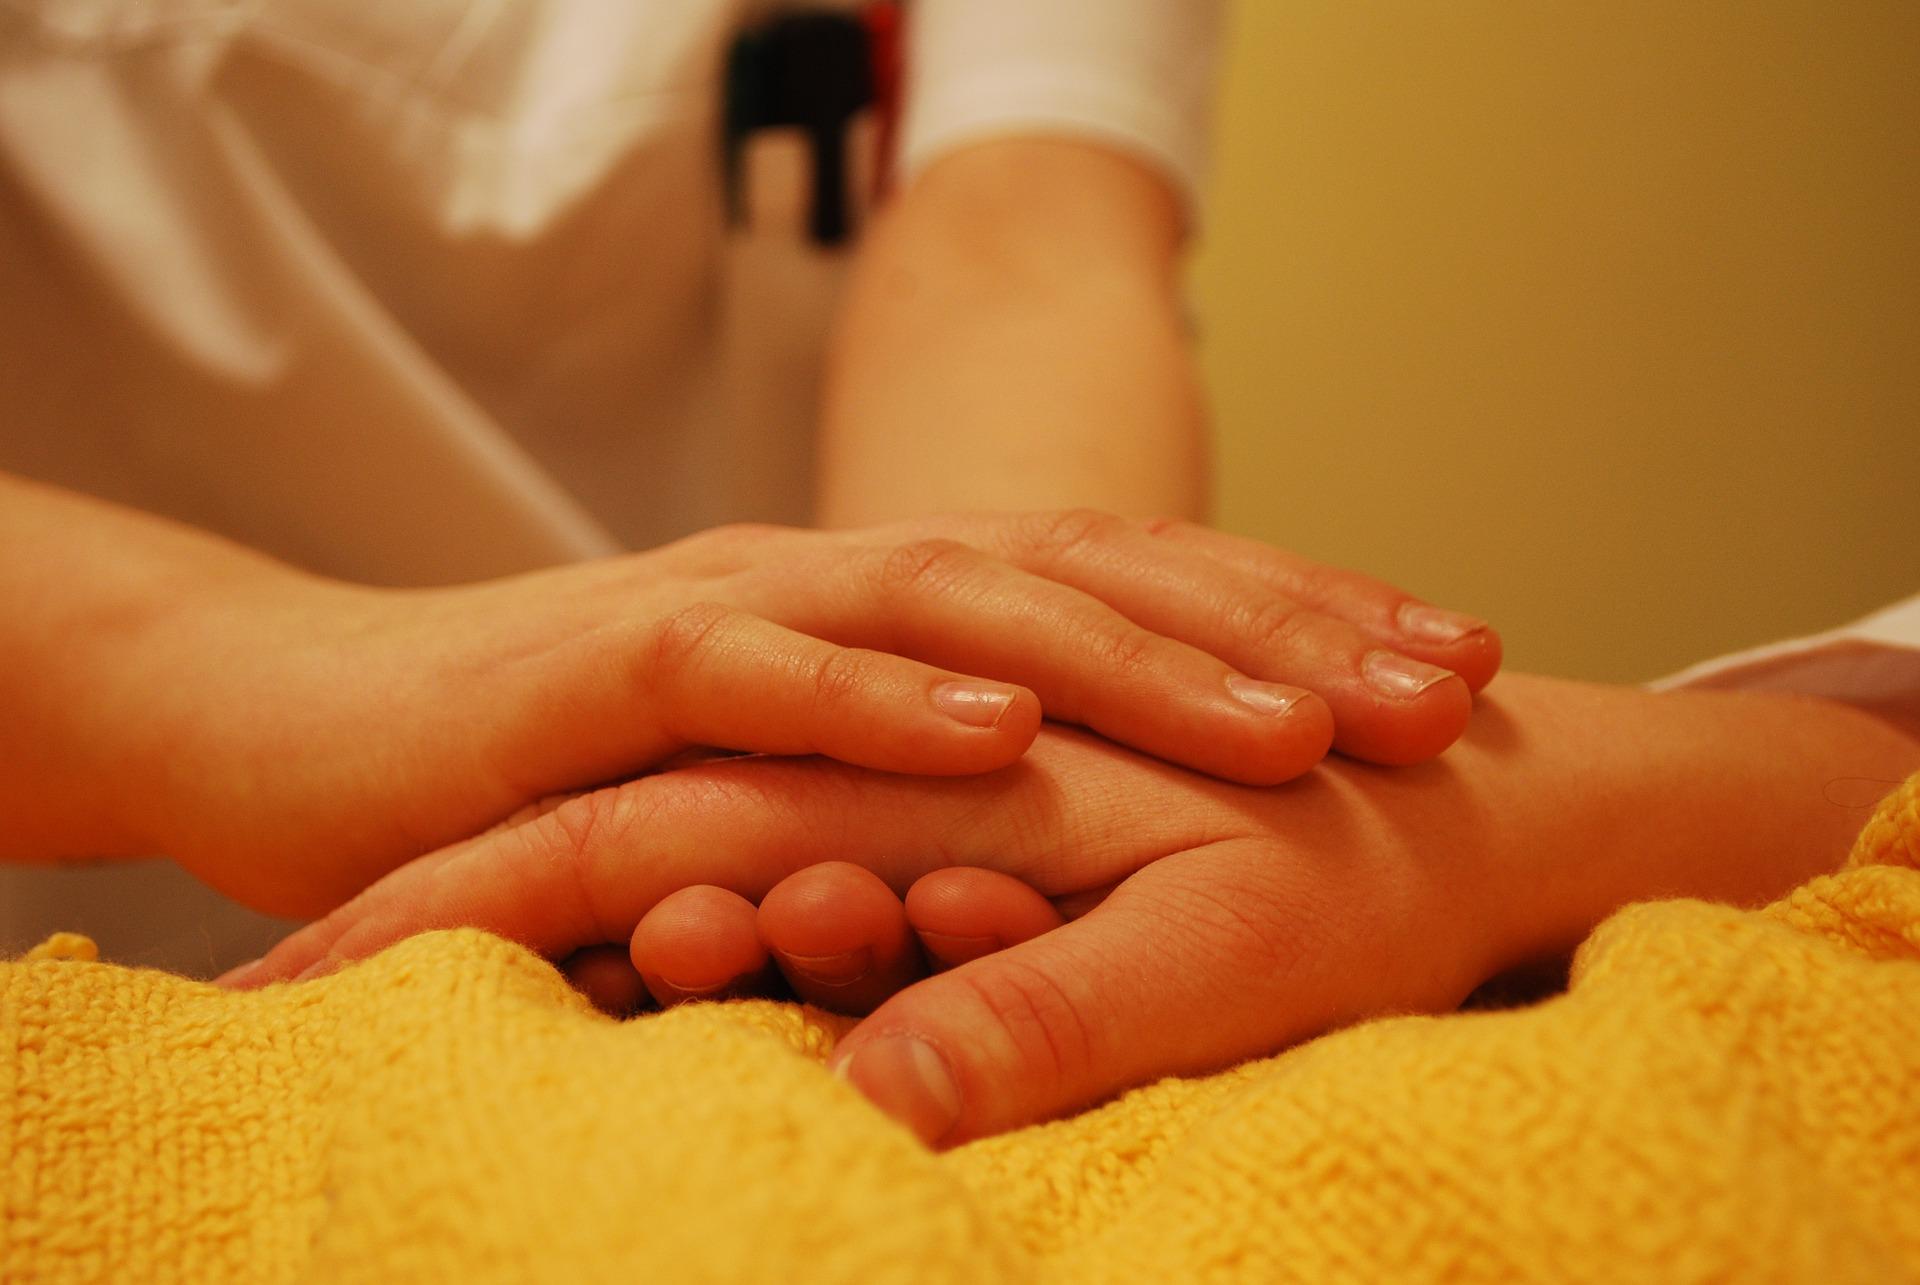 Betreuervergütung – als unzulässige Rechtsausübung